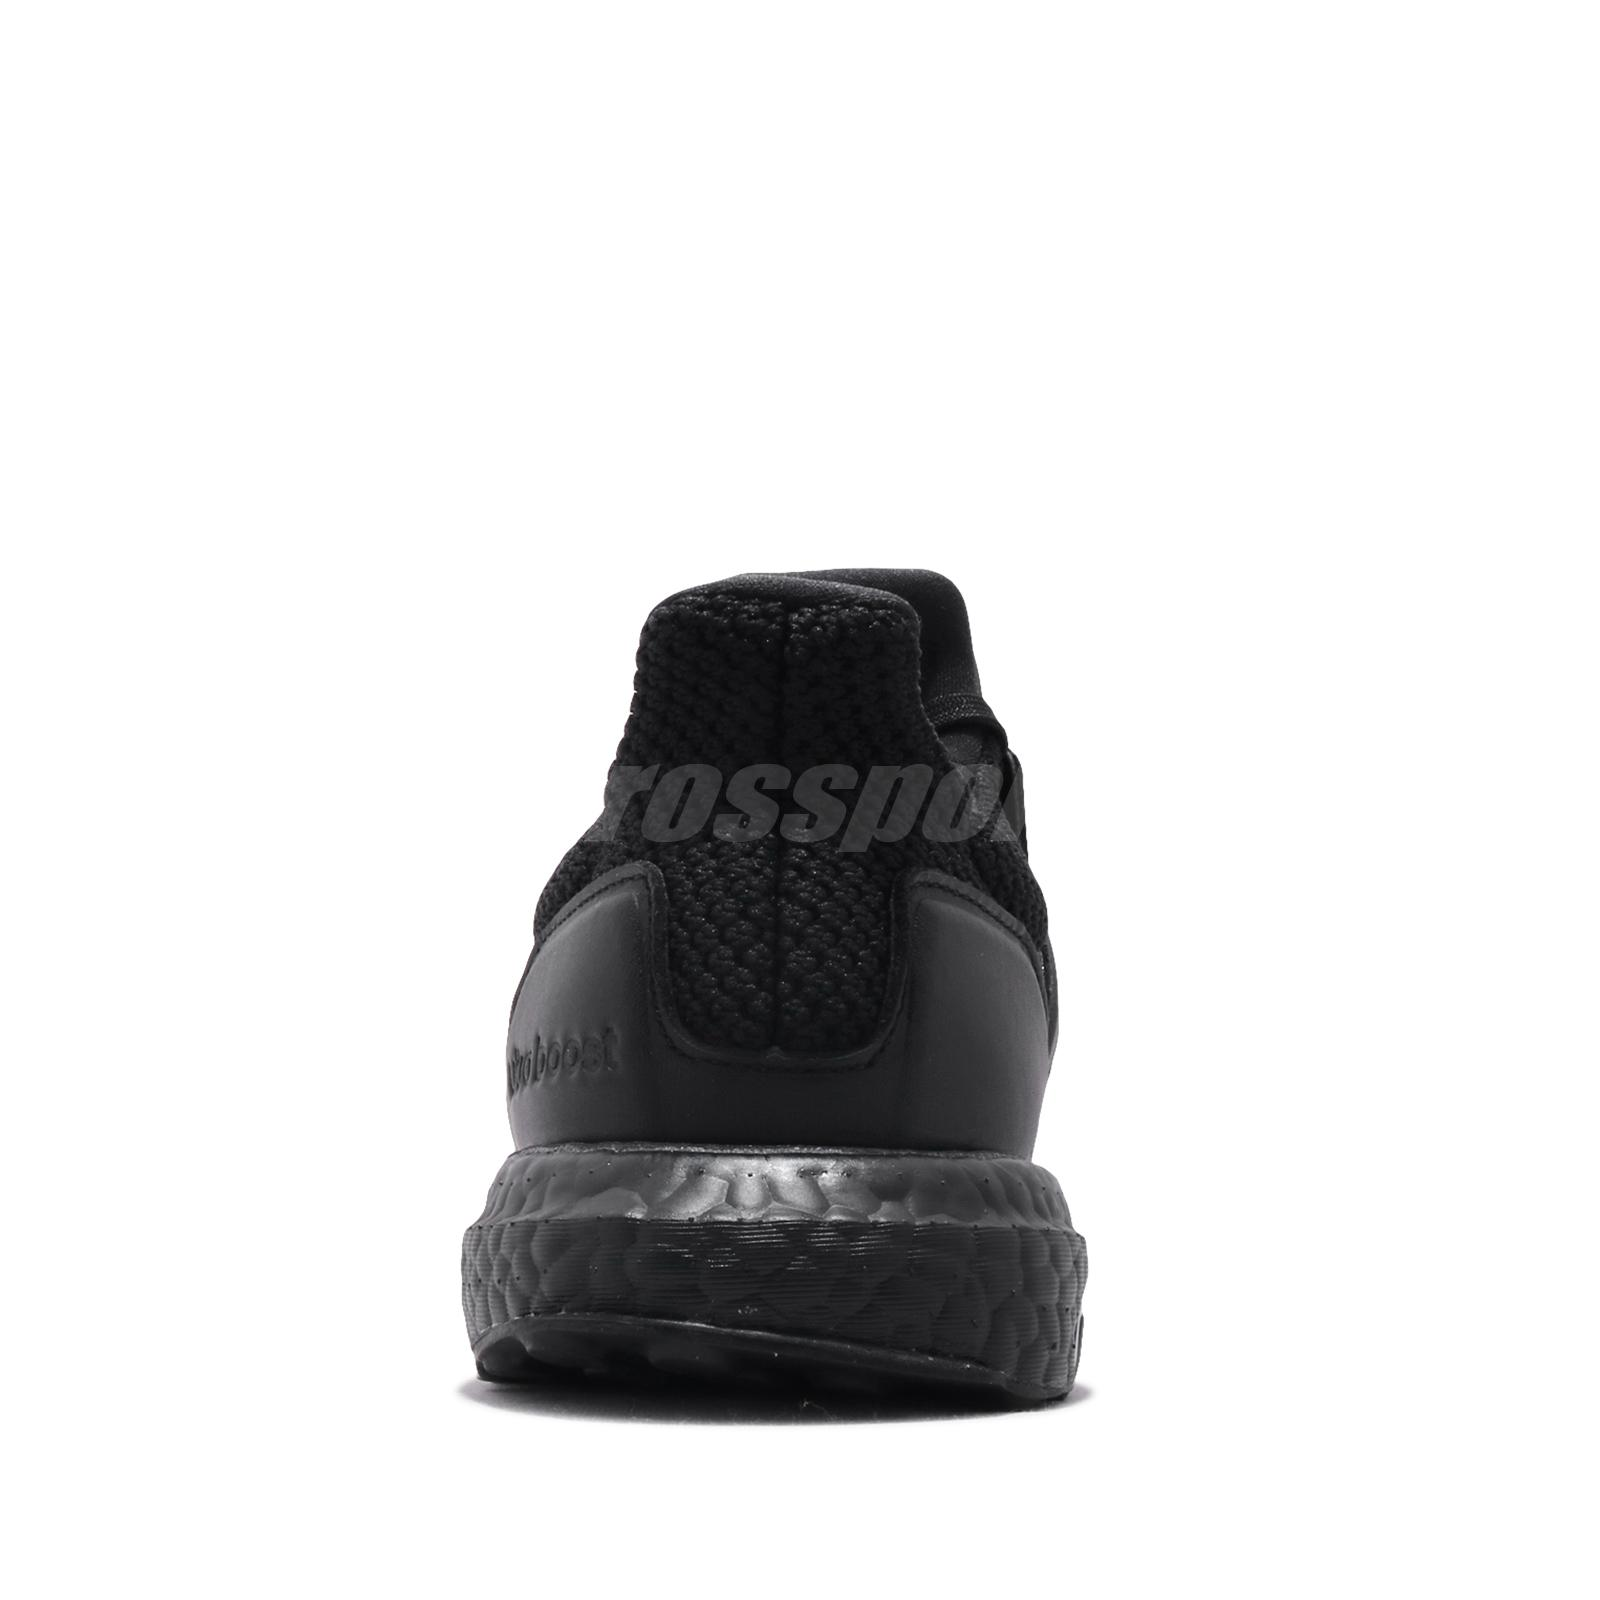 Details About Adidas Ultraboost X Manu Fc Manchester United Rose Black Red Men Shoes Eg8088